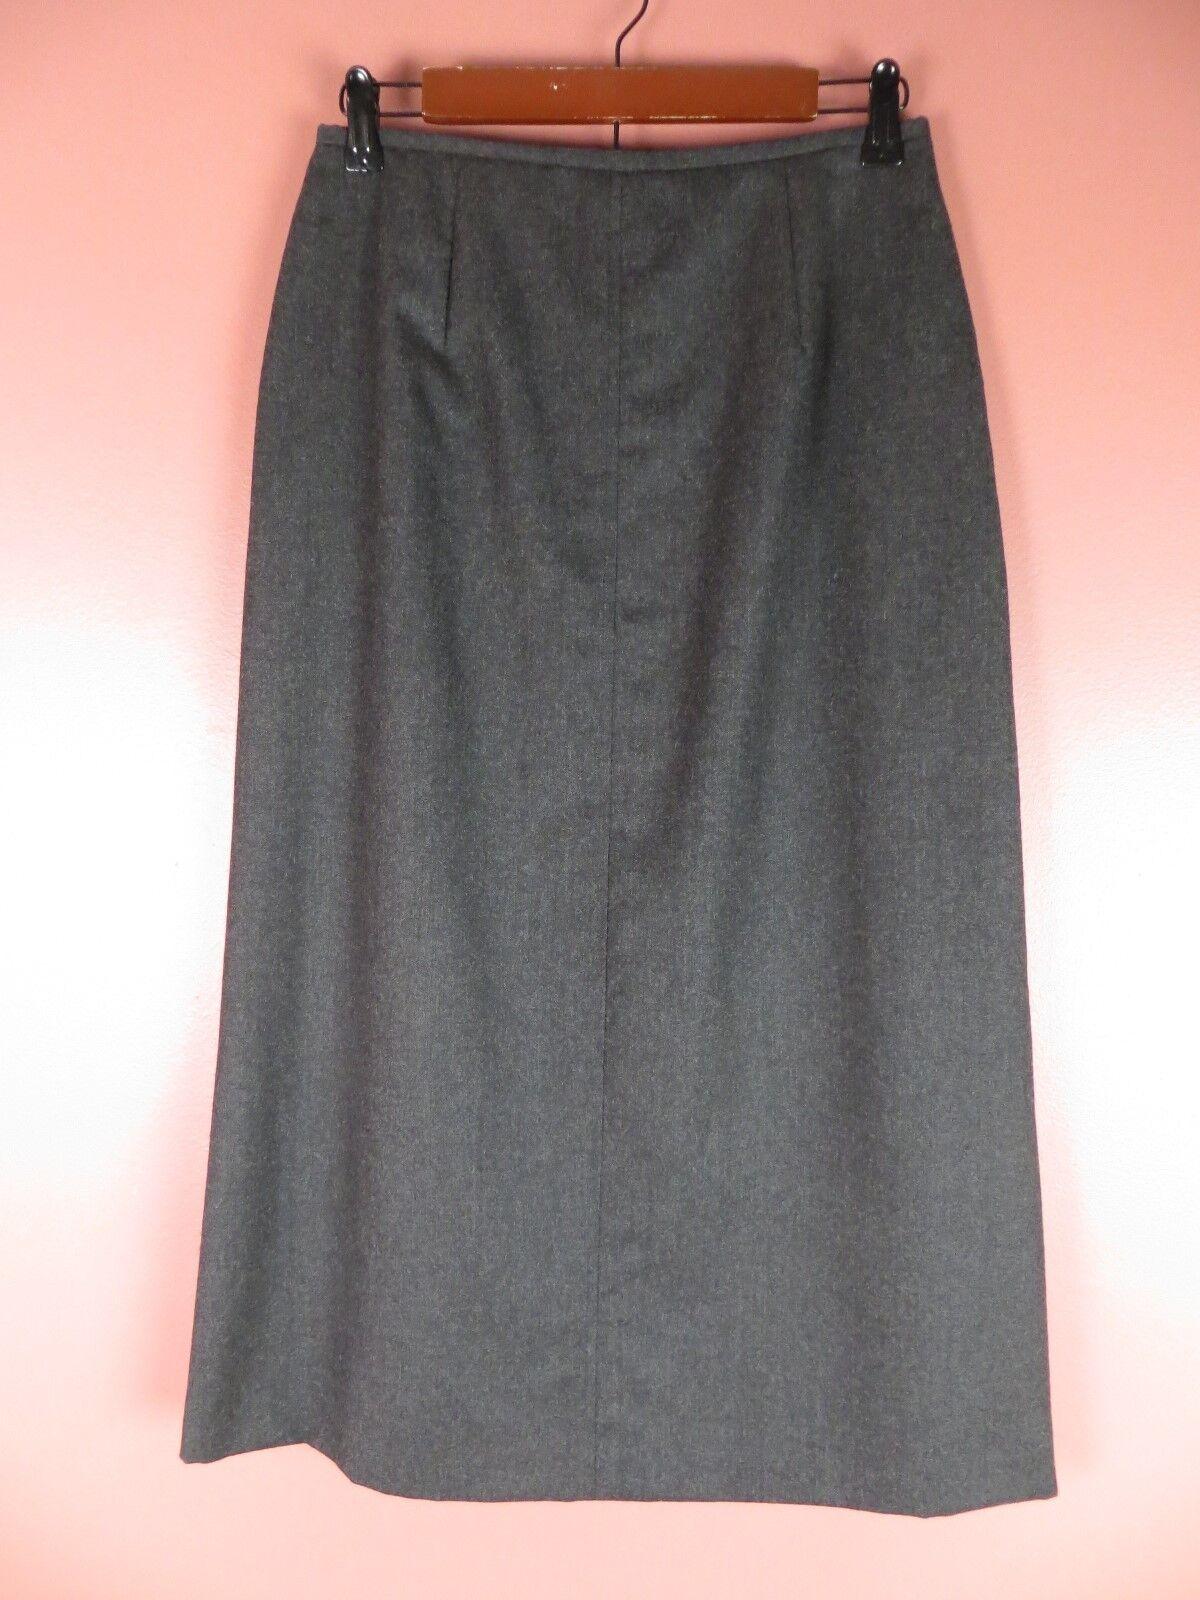 SK10539- TALBOTS Woman 100% Seasonless Wool Pencil Skirt Dark Charcoal Sz 8P